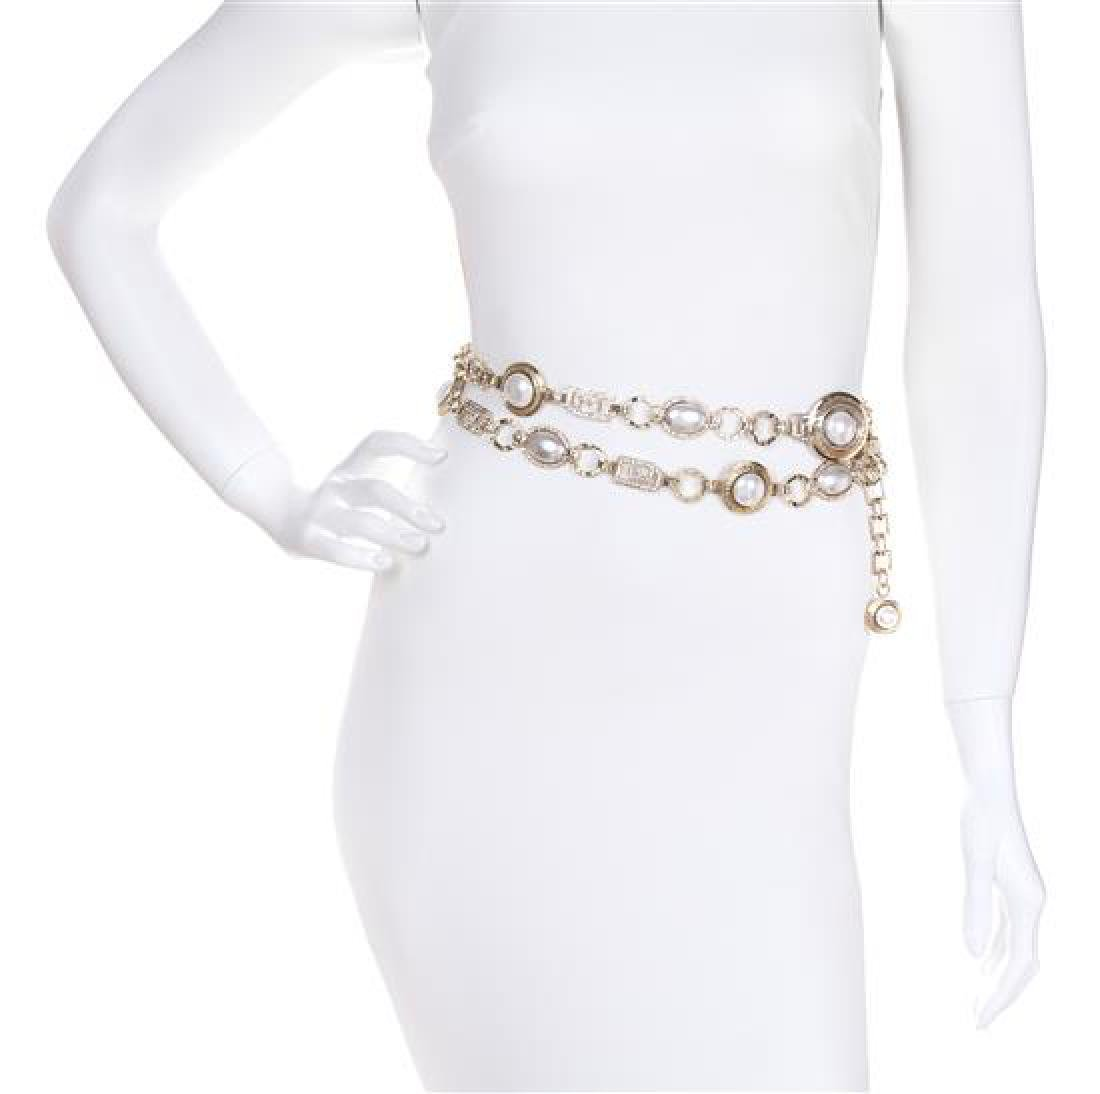 A Gianni Versace Pearl and Rhinestone Greco Link Belt,